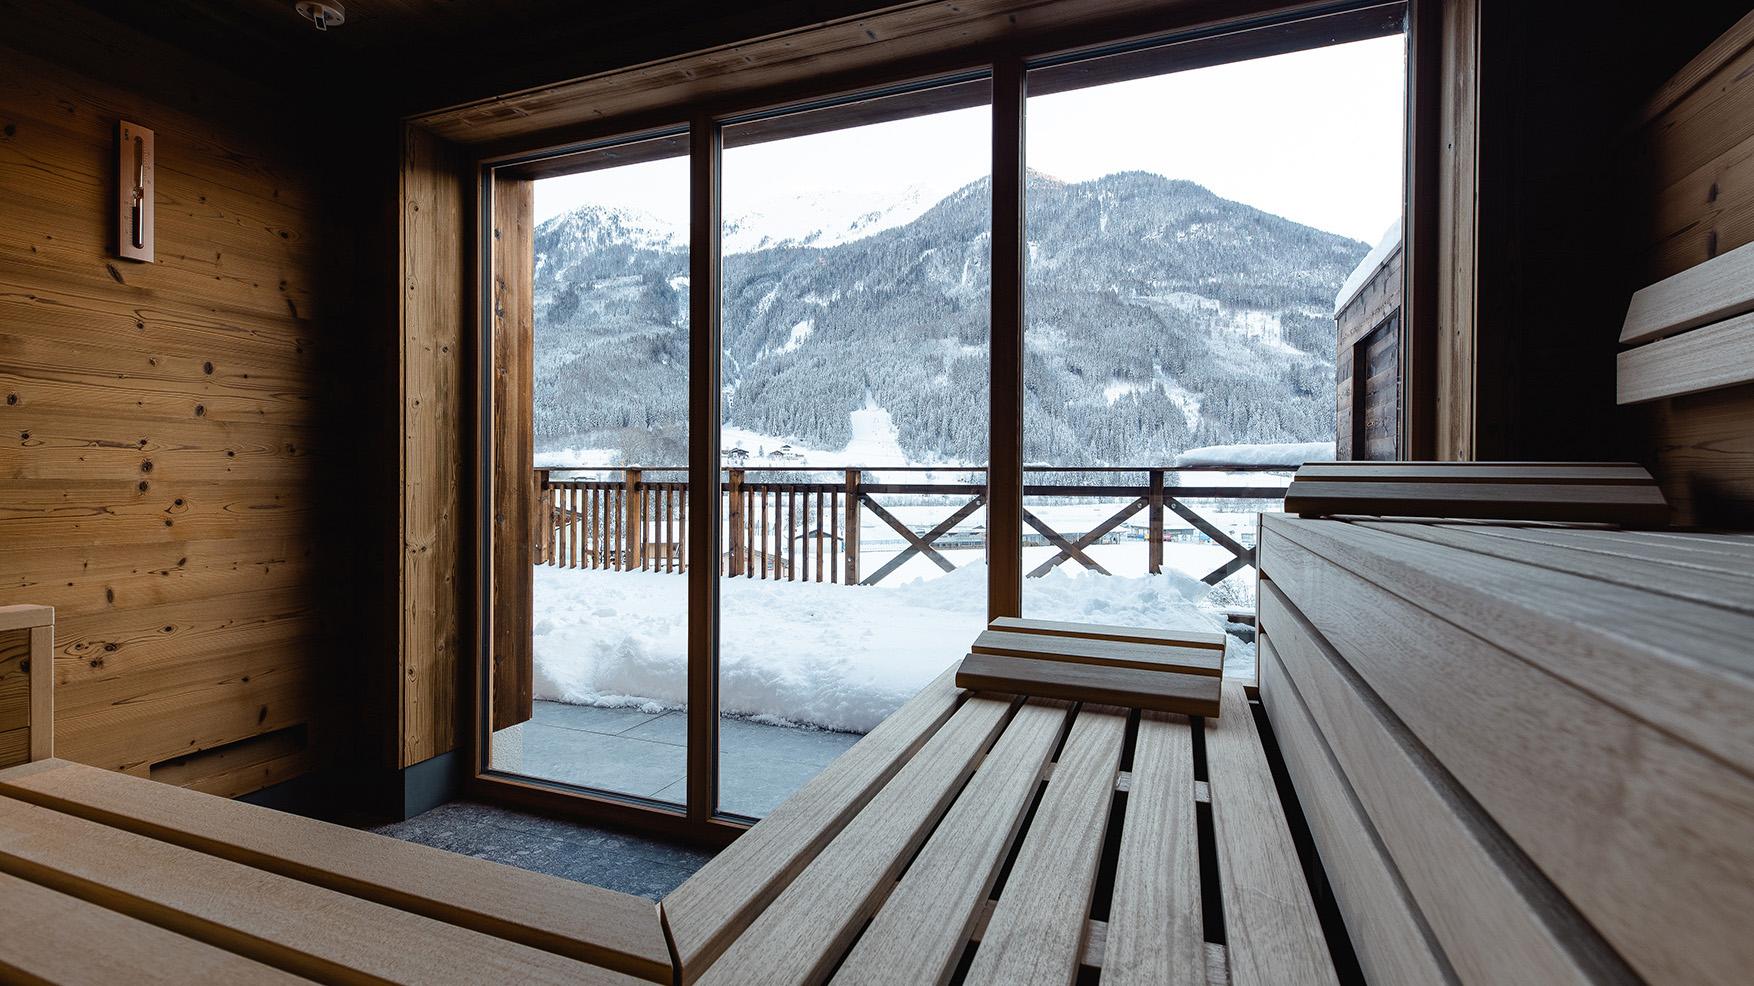 Snowbell Apartments Apartments, Austria